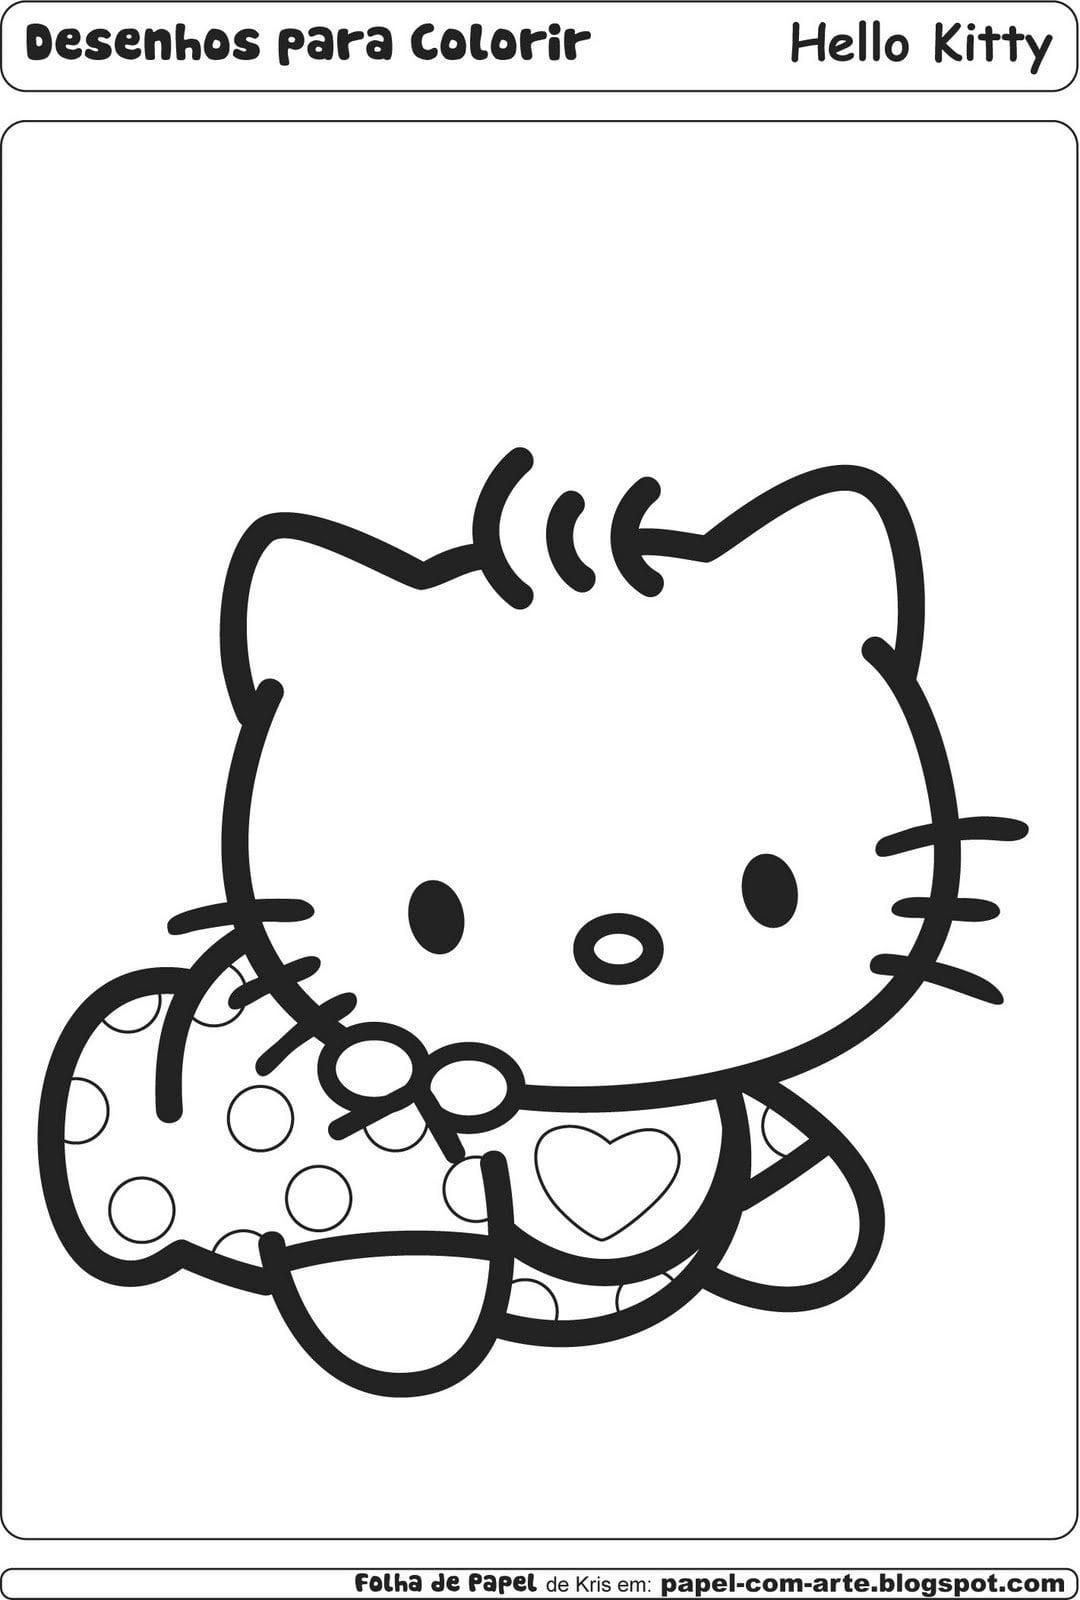 Desenho De Hello Kitty Para Colorir – Free Coloring Pages